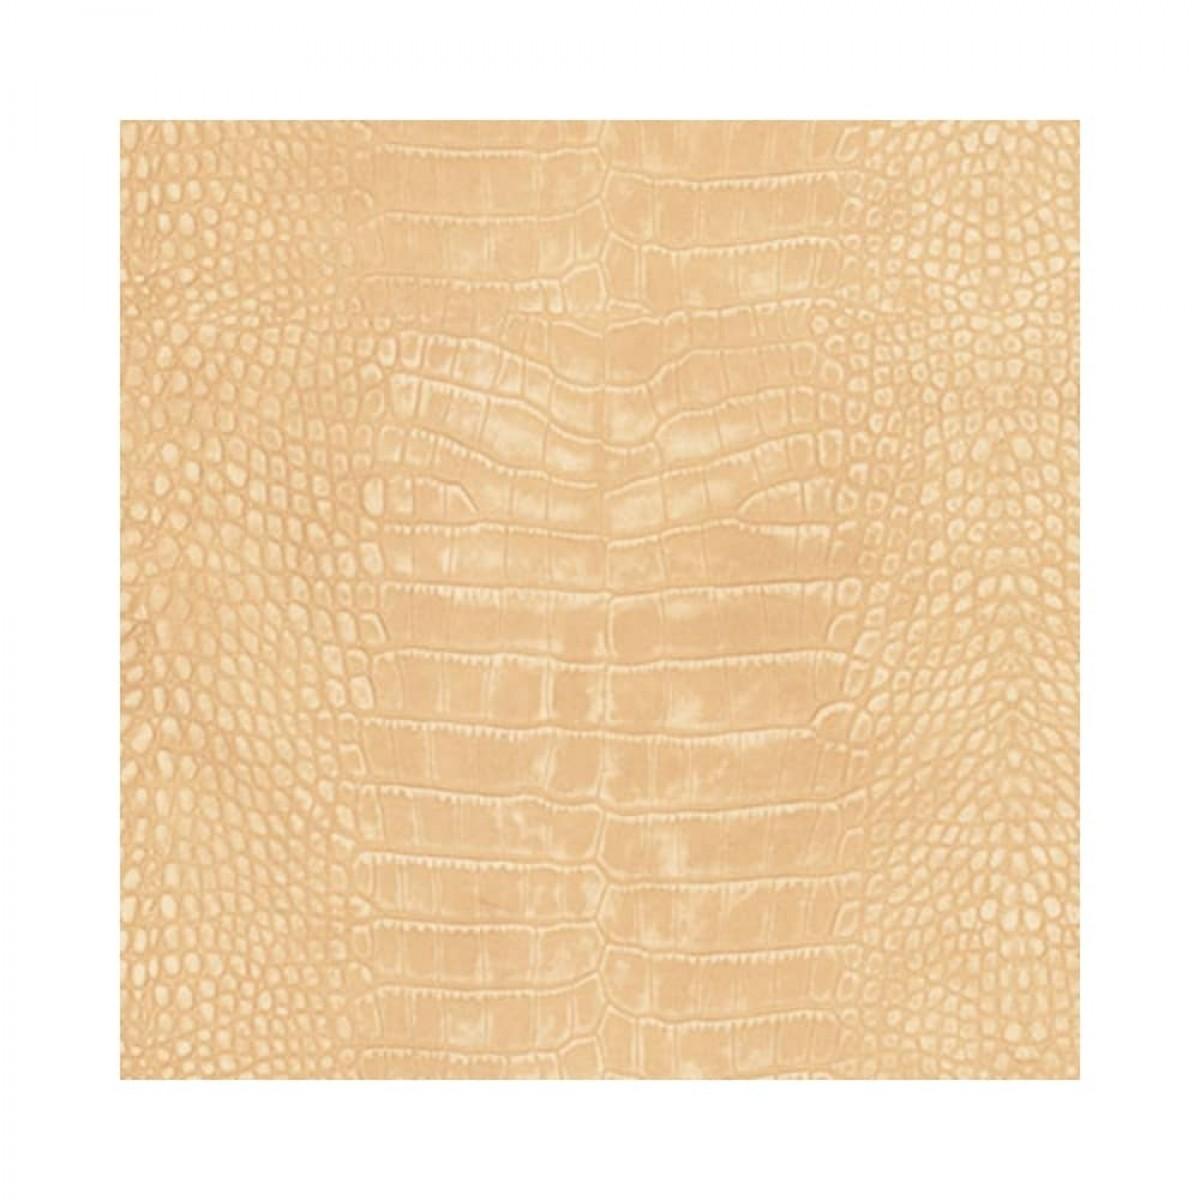 bobi taske - croco ficelle - kvalitet